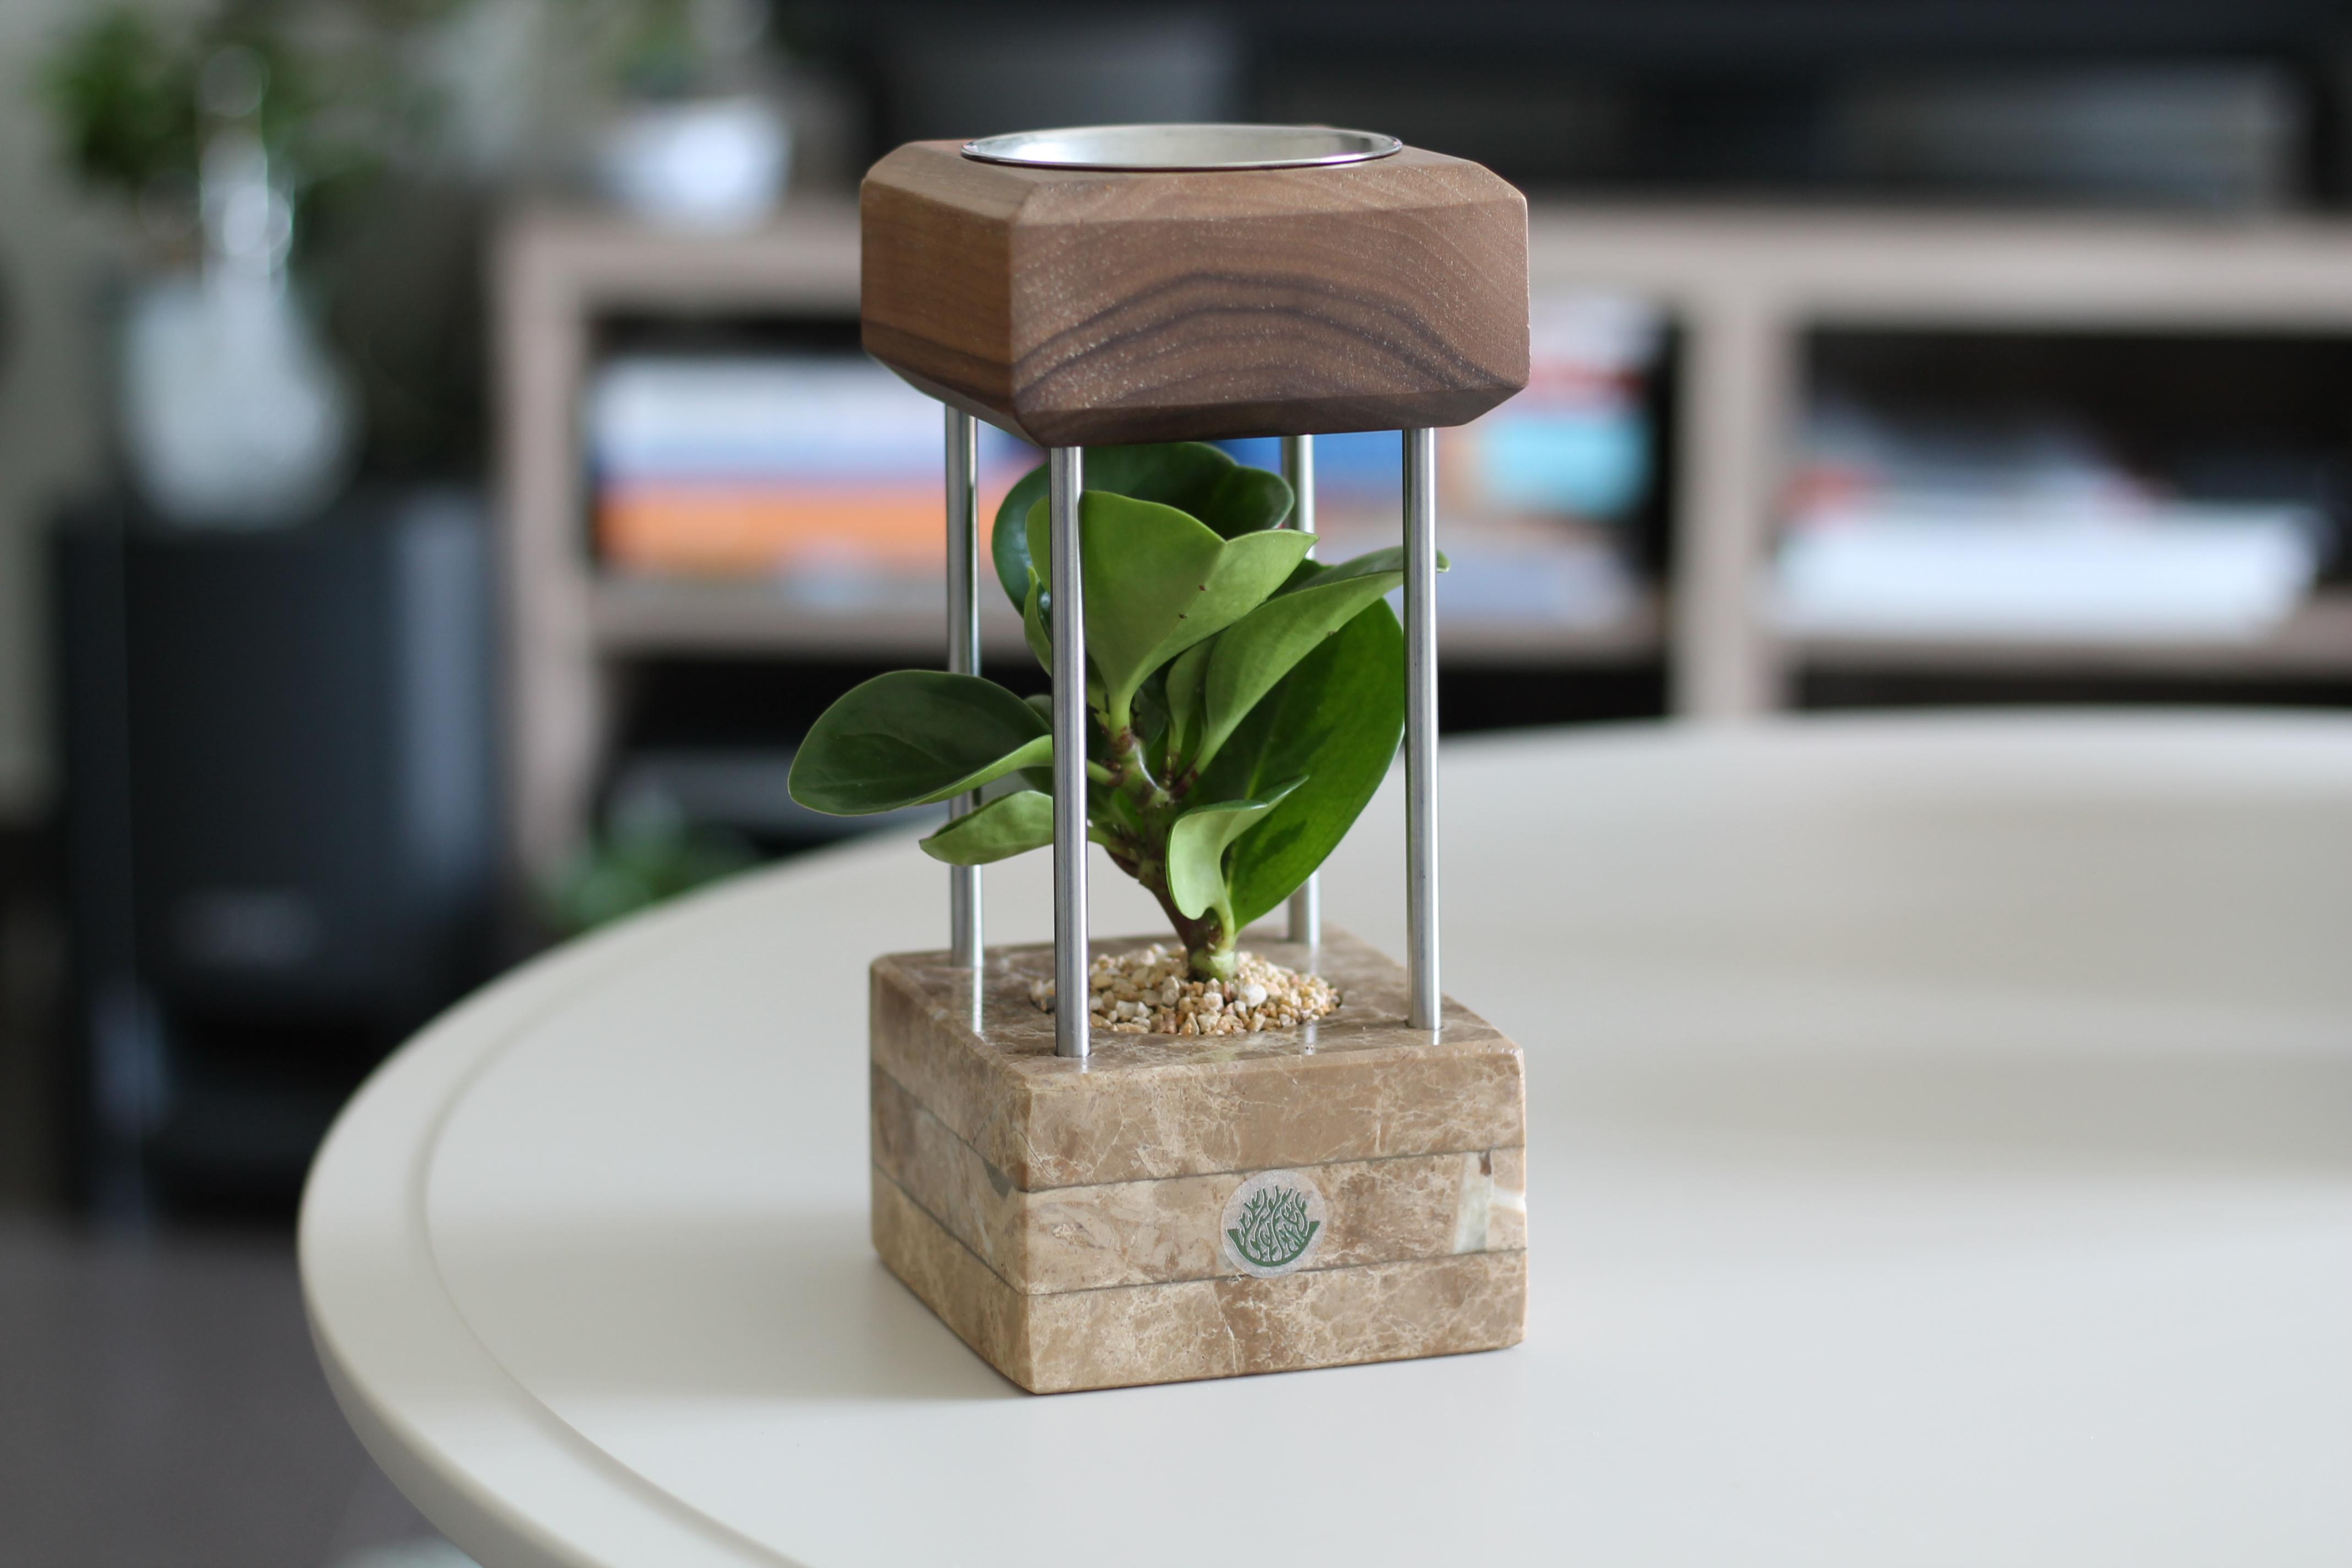 Beige Marble Mubkhar 'Office Plants'